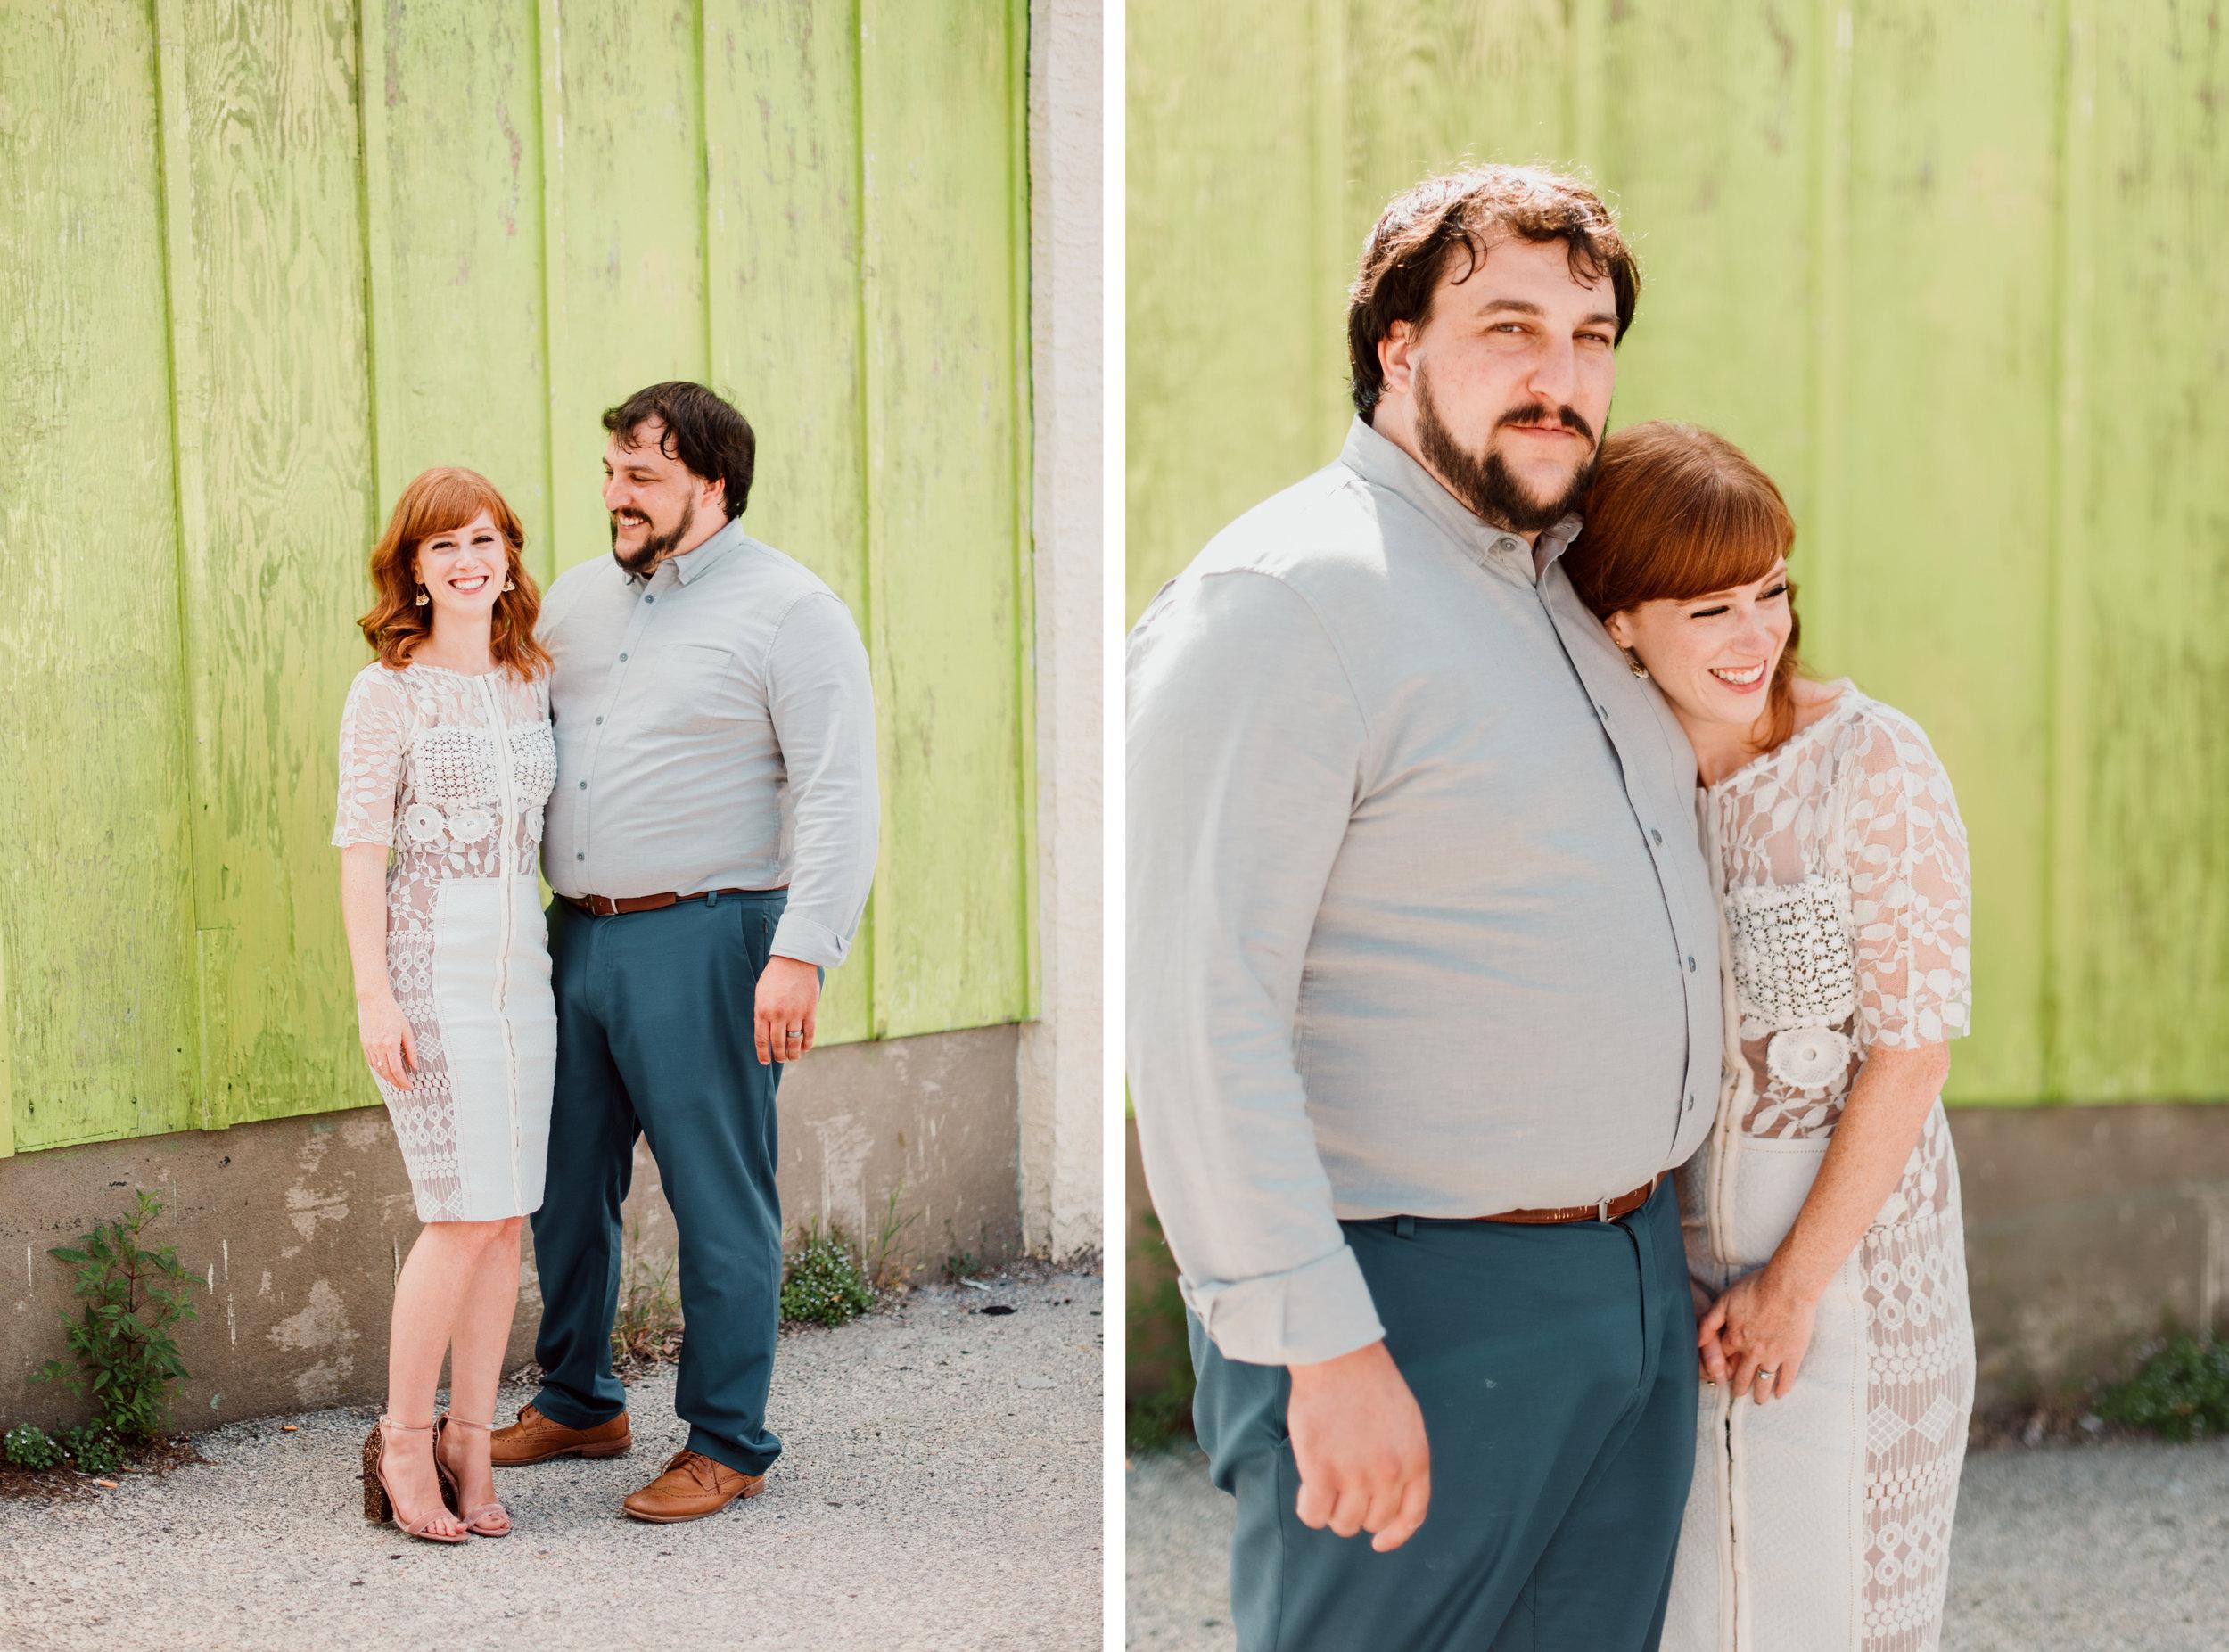 Philadelphia-wedding-photographer-la-cabra-brewery-diy-Peaberry-Photography-020.jpg